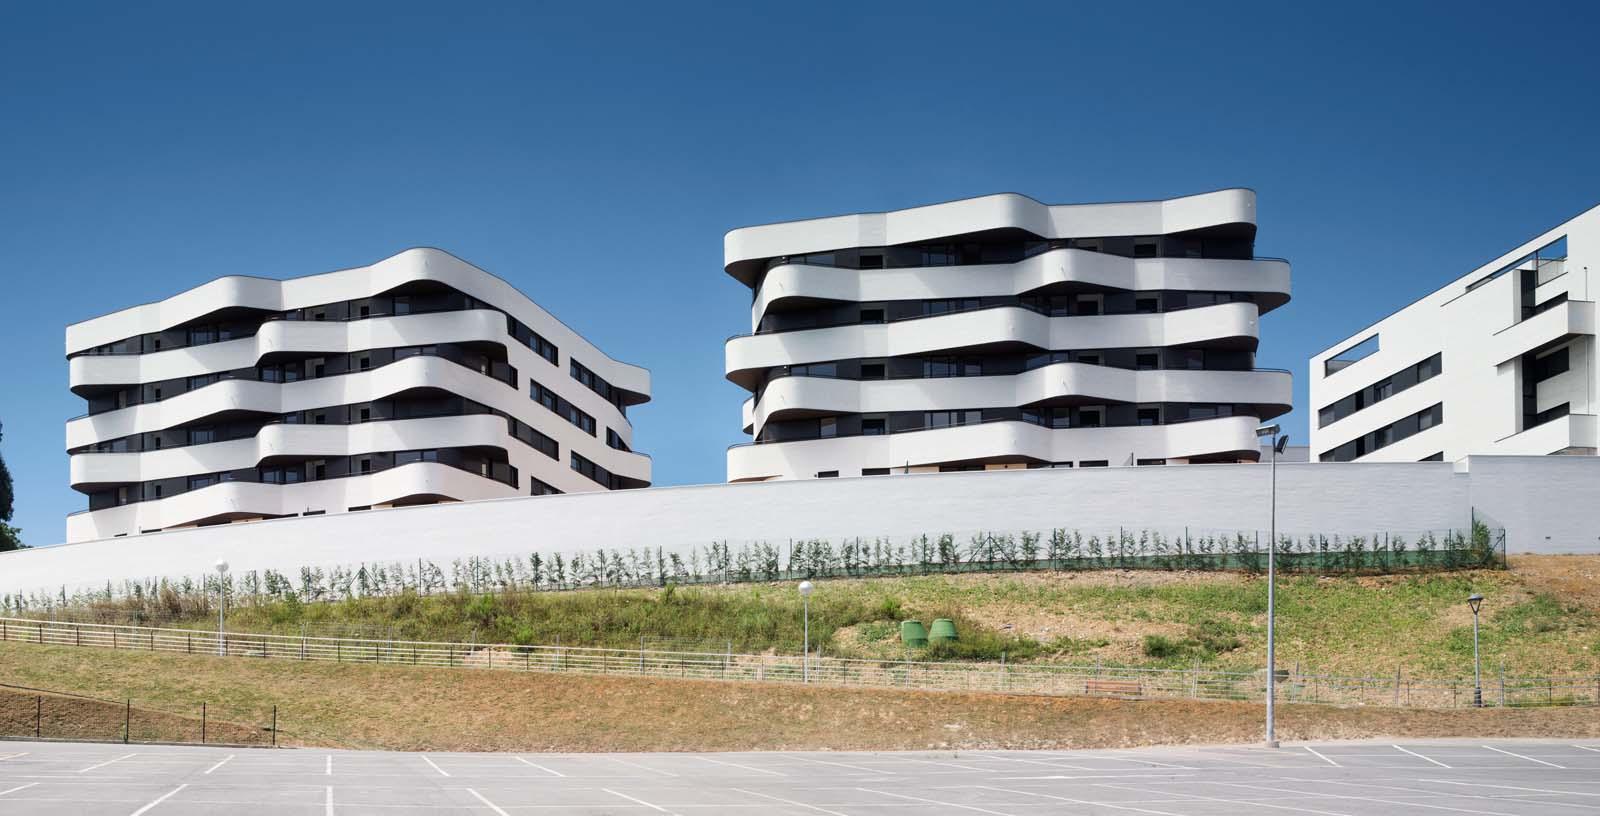 58_subsidized_flats_Torresolo_01_Architecture_IDOM_photos_Aitor_Ortiz